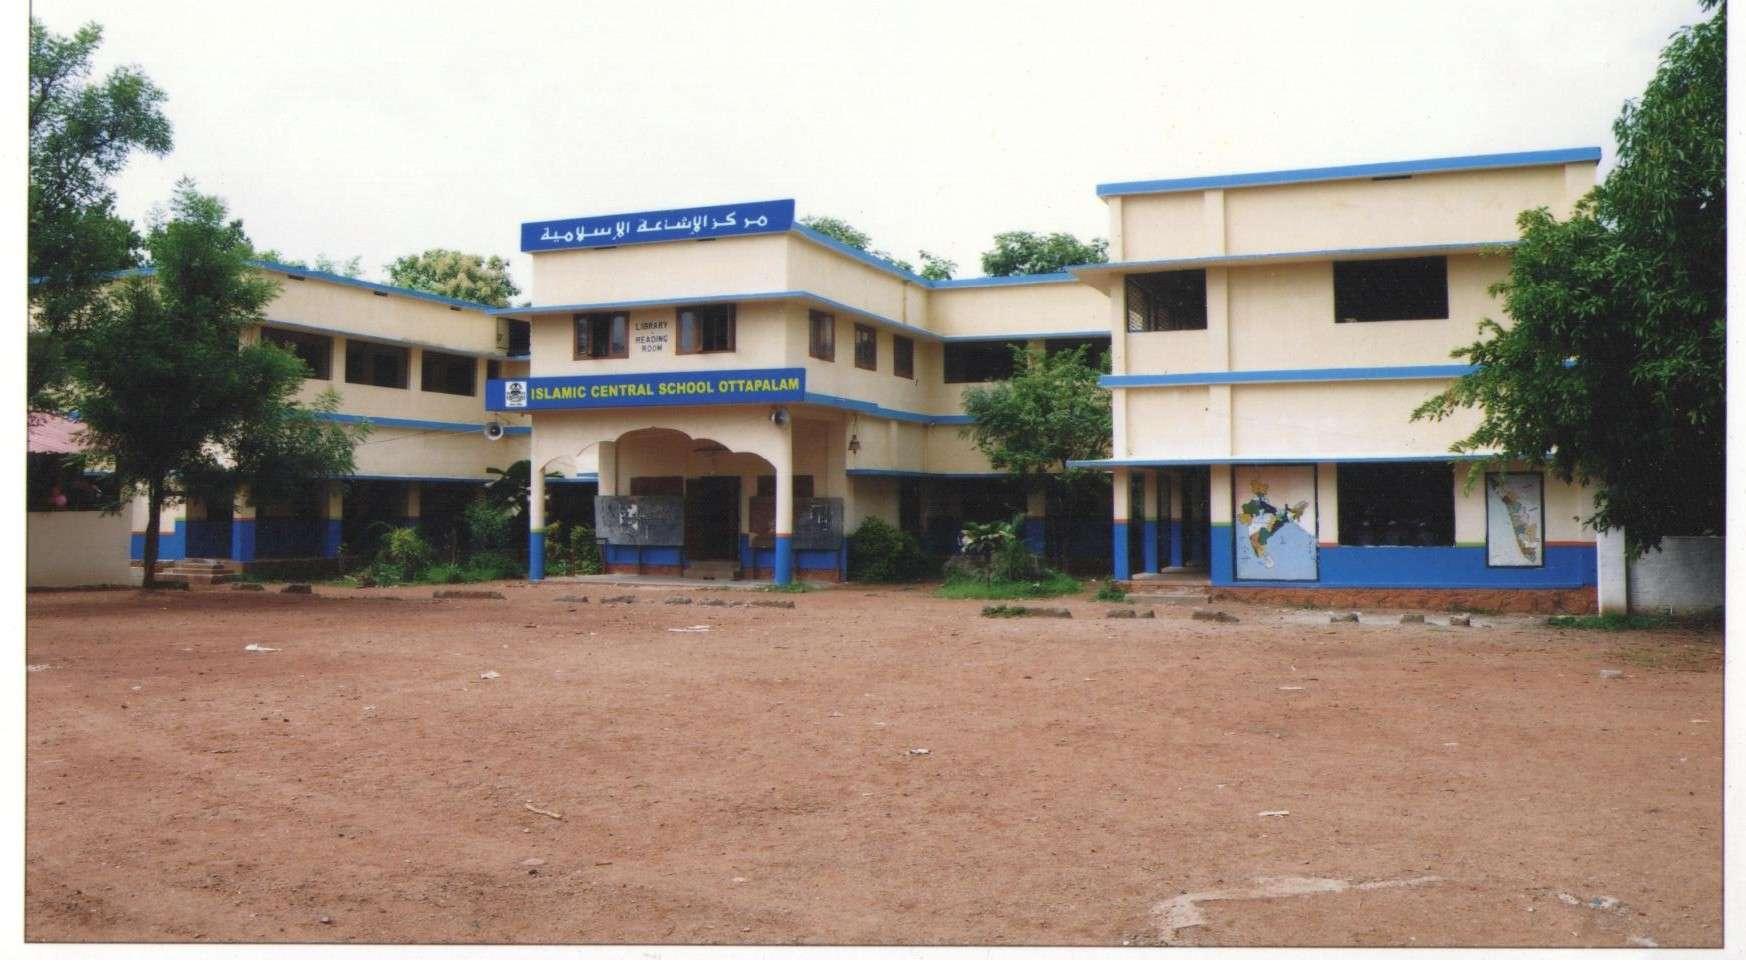 ISLAMIC CENTRAL SCHOOL OTTAPALAM PALAKKAD KERALA 930243